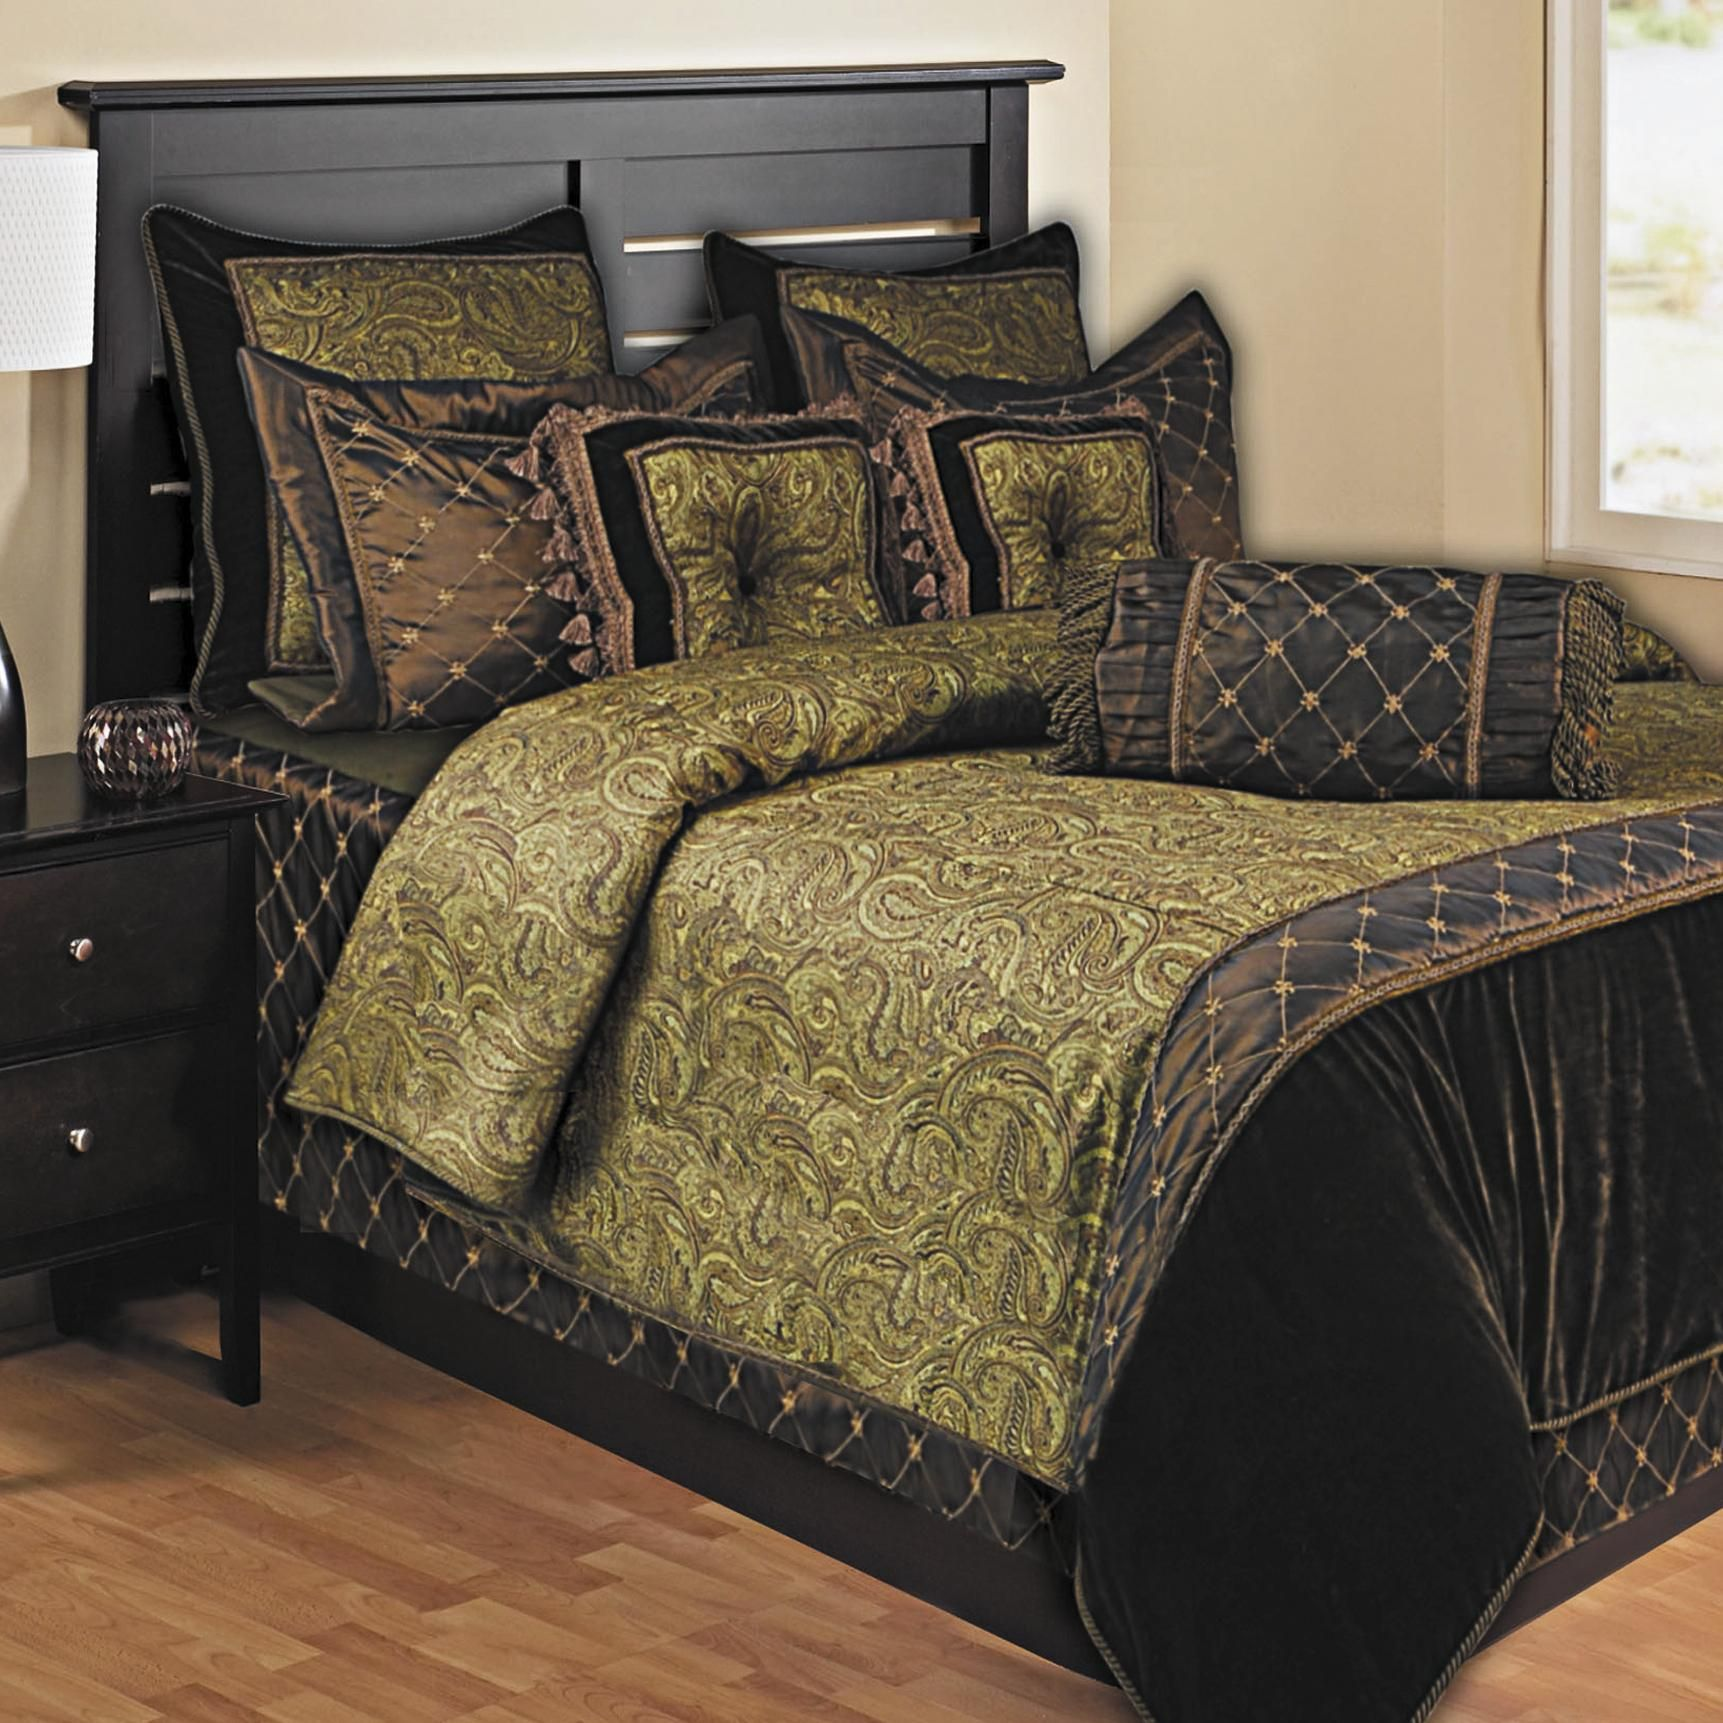 kathy ireland estate classic bedding set i thinking itu0027s time for new master bedding